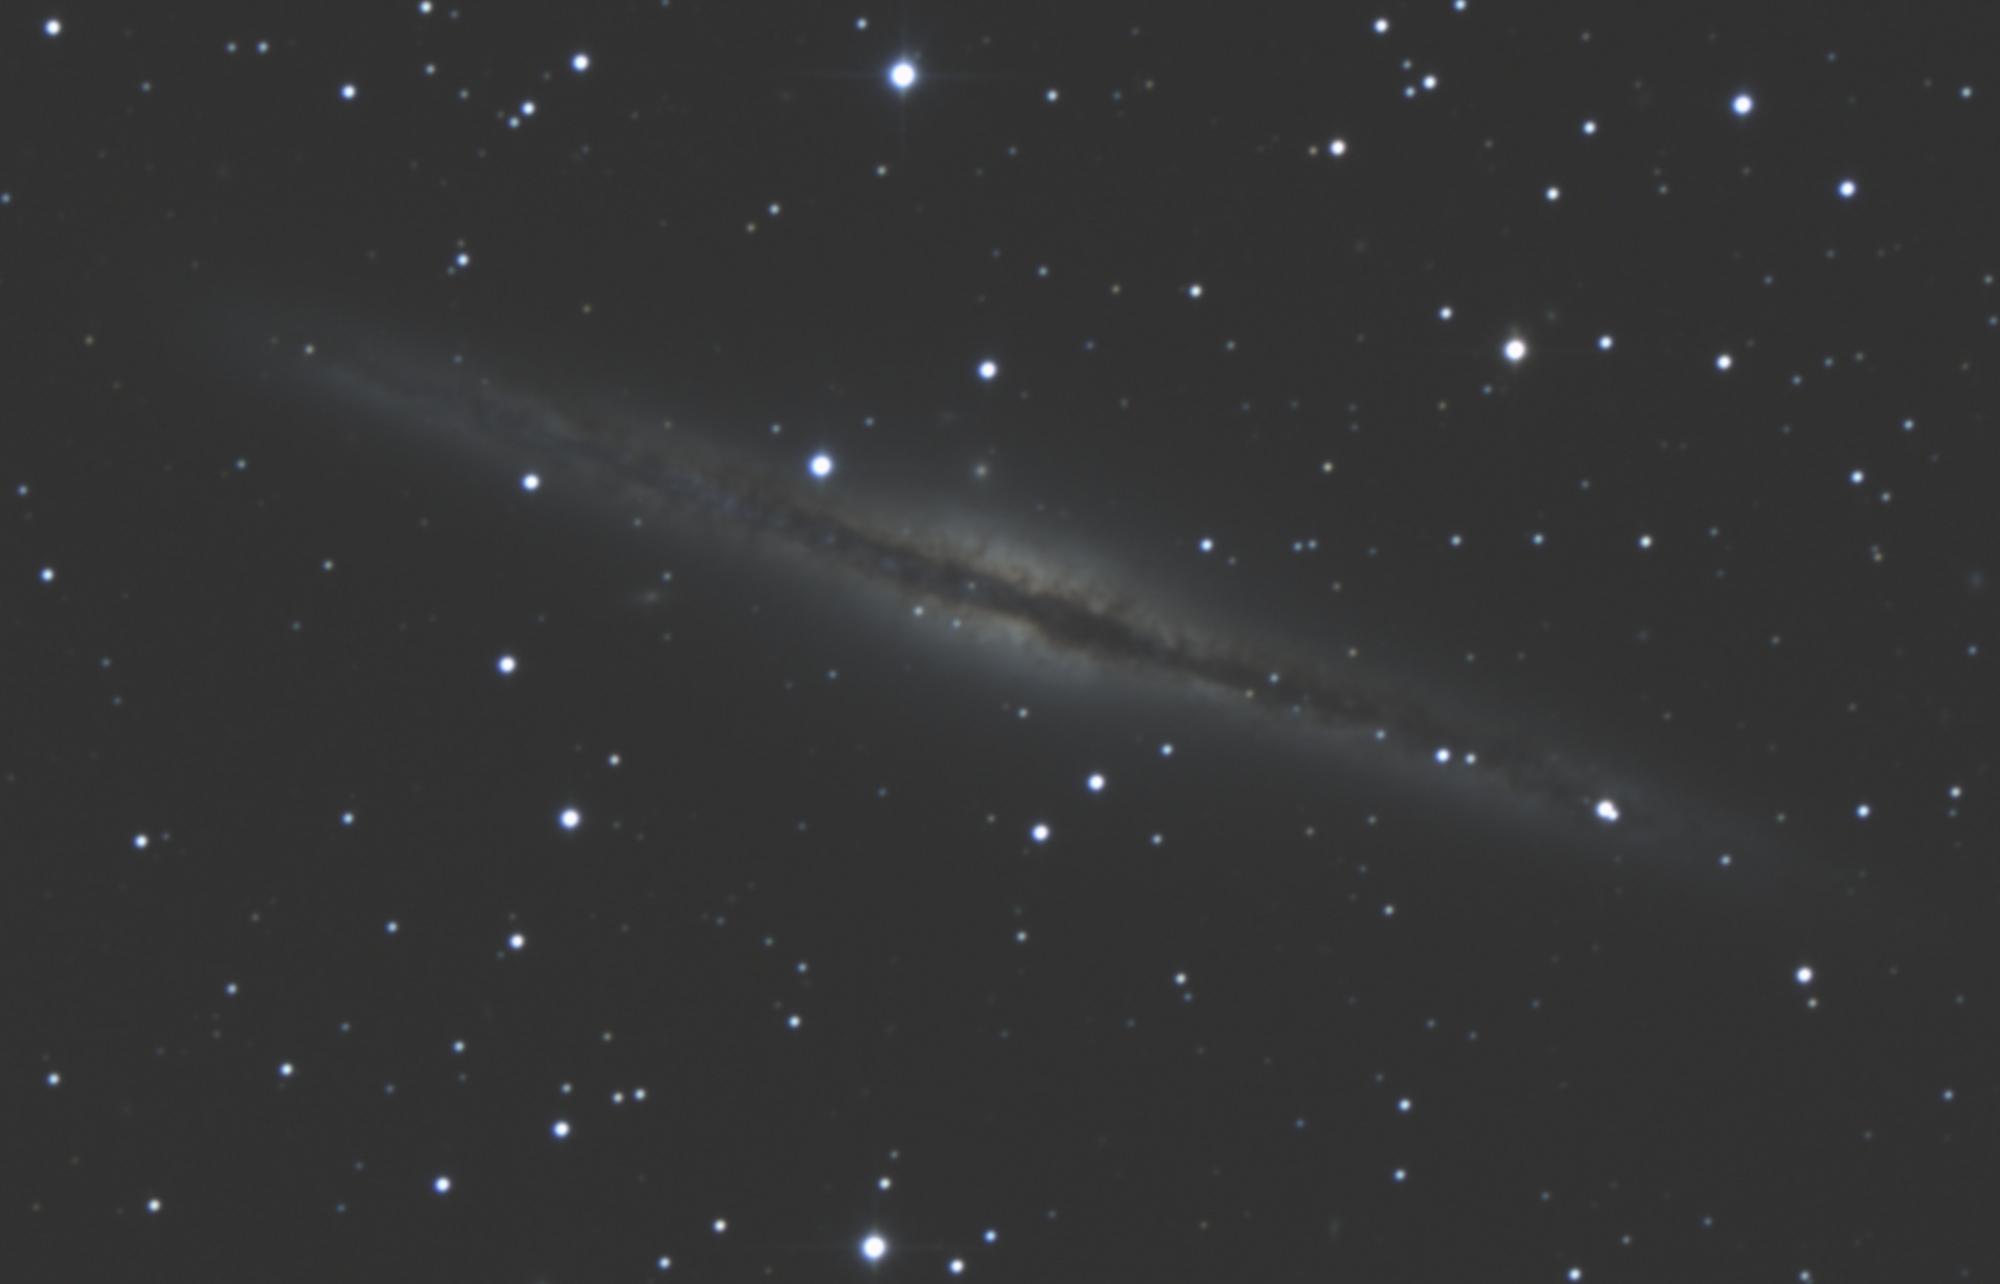 large.5c2b718115eae_NGC891coulcrop.jpg.688f7832443c8bfbedb79a4cf795e3df.thumb.jpg.236c608f9bbae27b0946d8e6986fb9c2.jpg